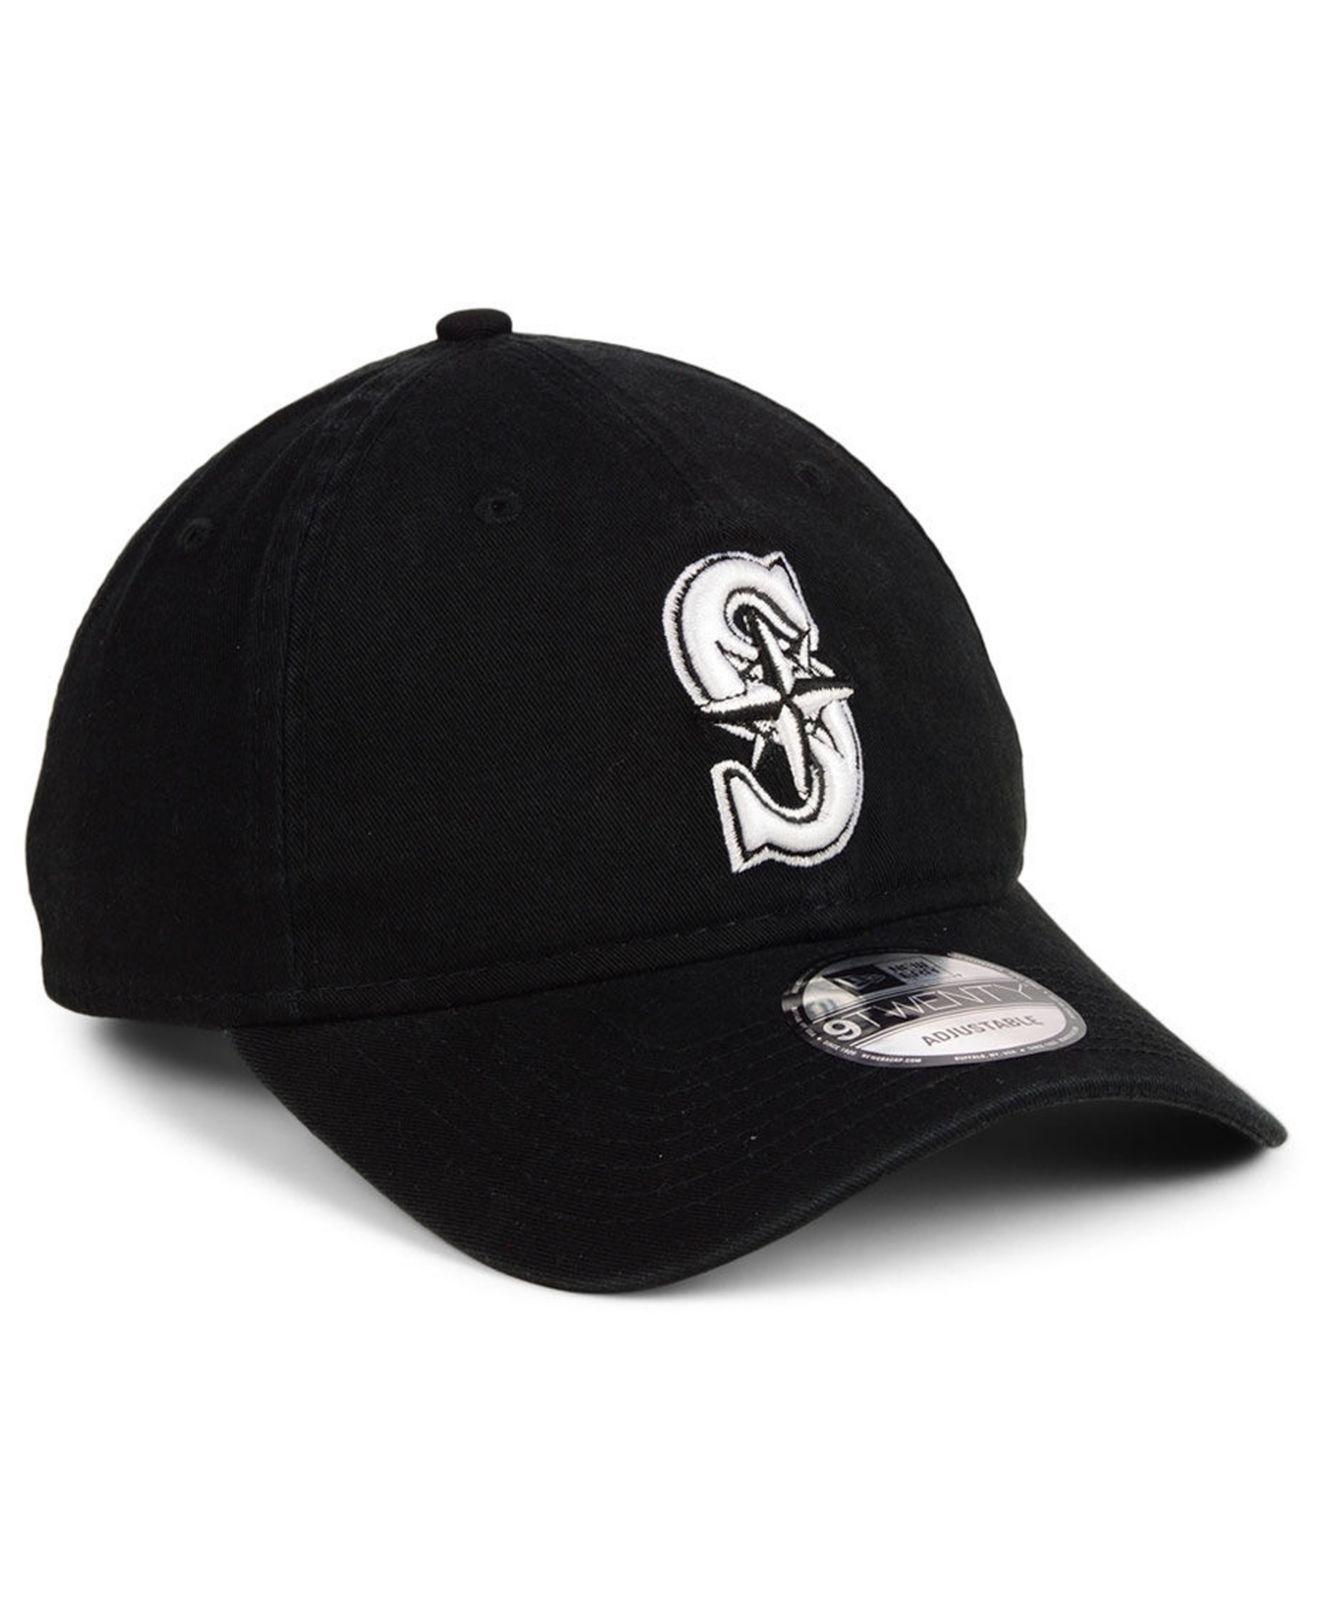 premium selection 24cae c72cb KTZ - Black Seattle Mariners Core 9twenty Strapback Cap for Men - Lyst.  View fullscreen